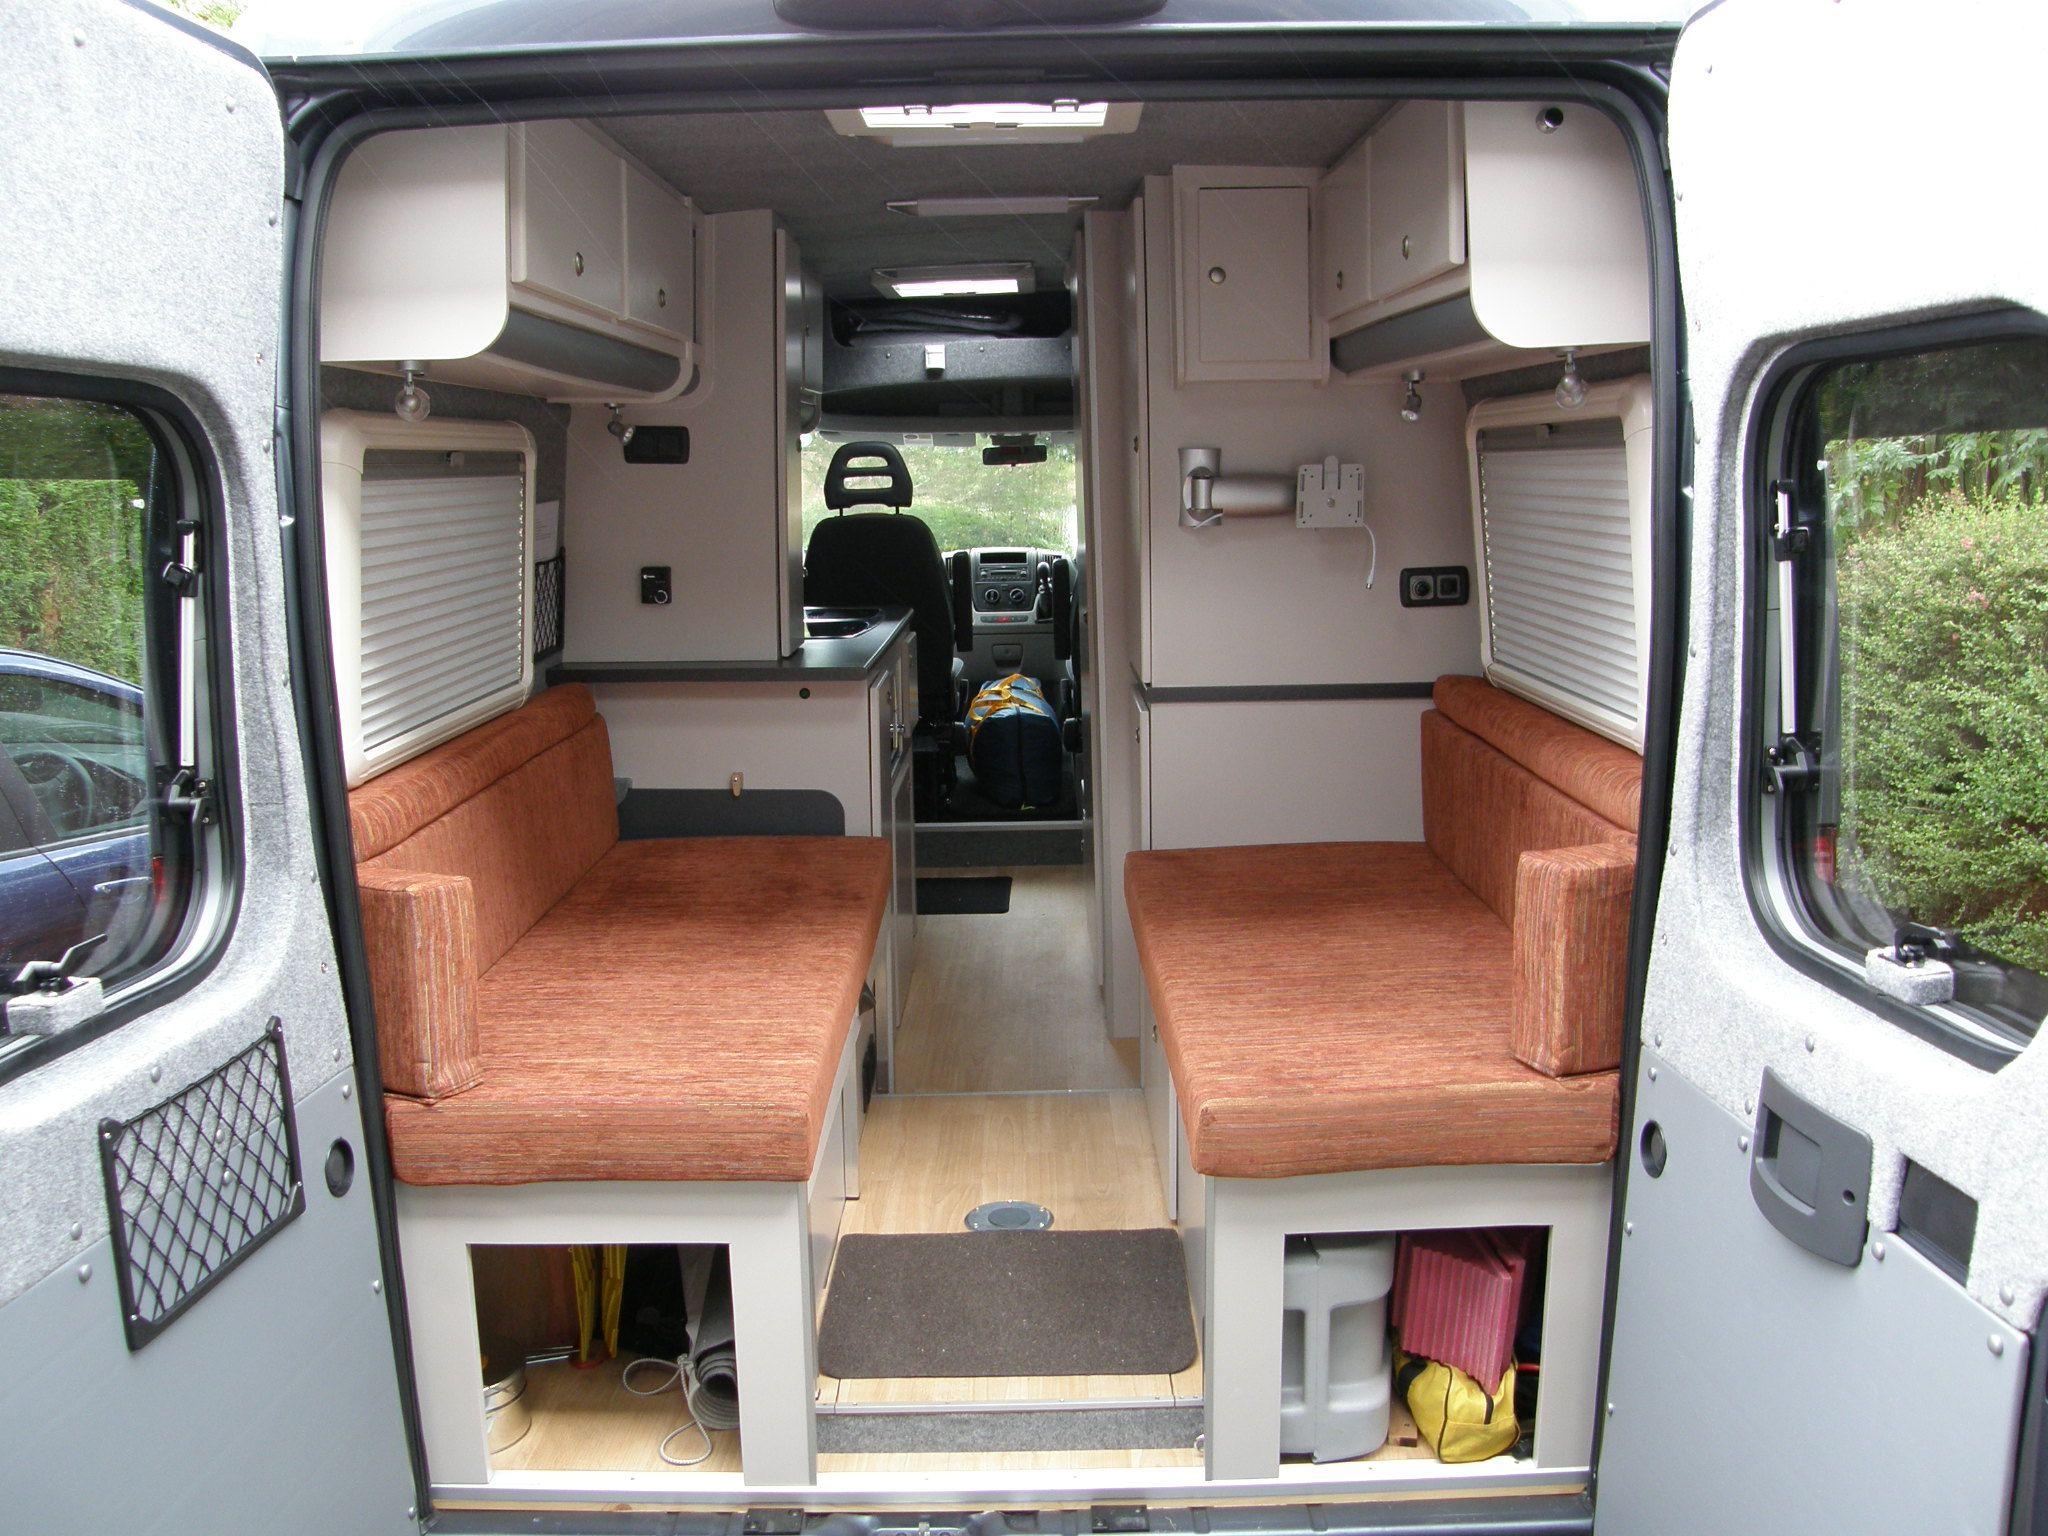 P7150001JPG 2048x1536 T5 TransporterVw